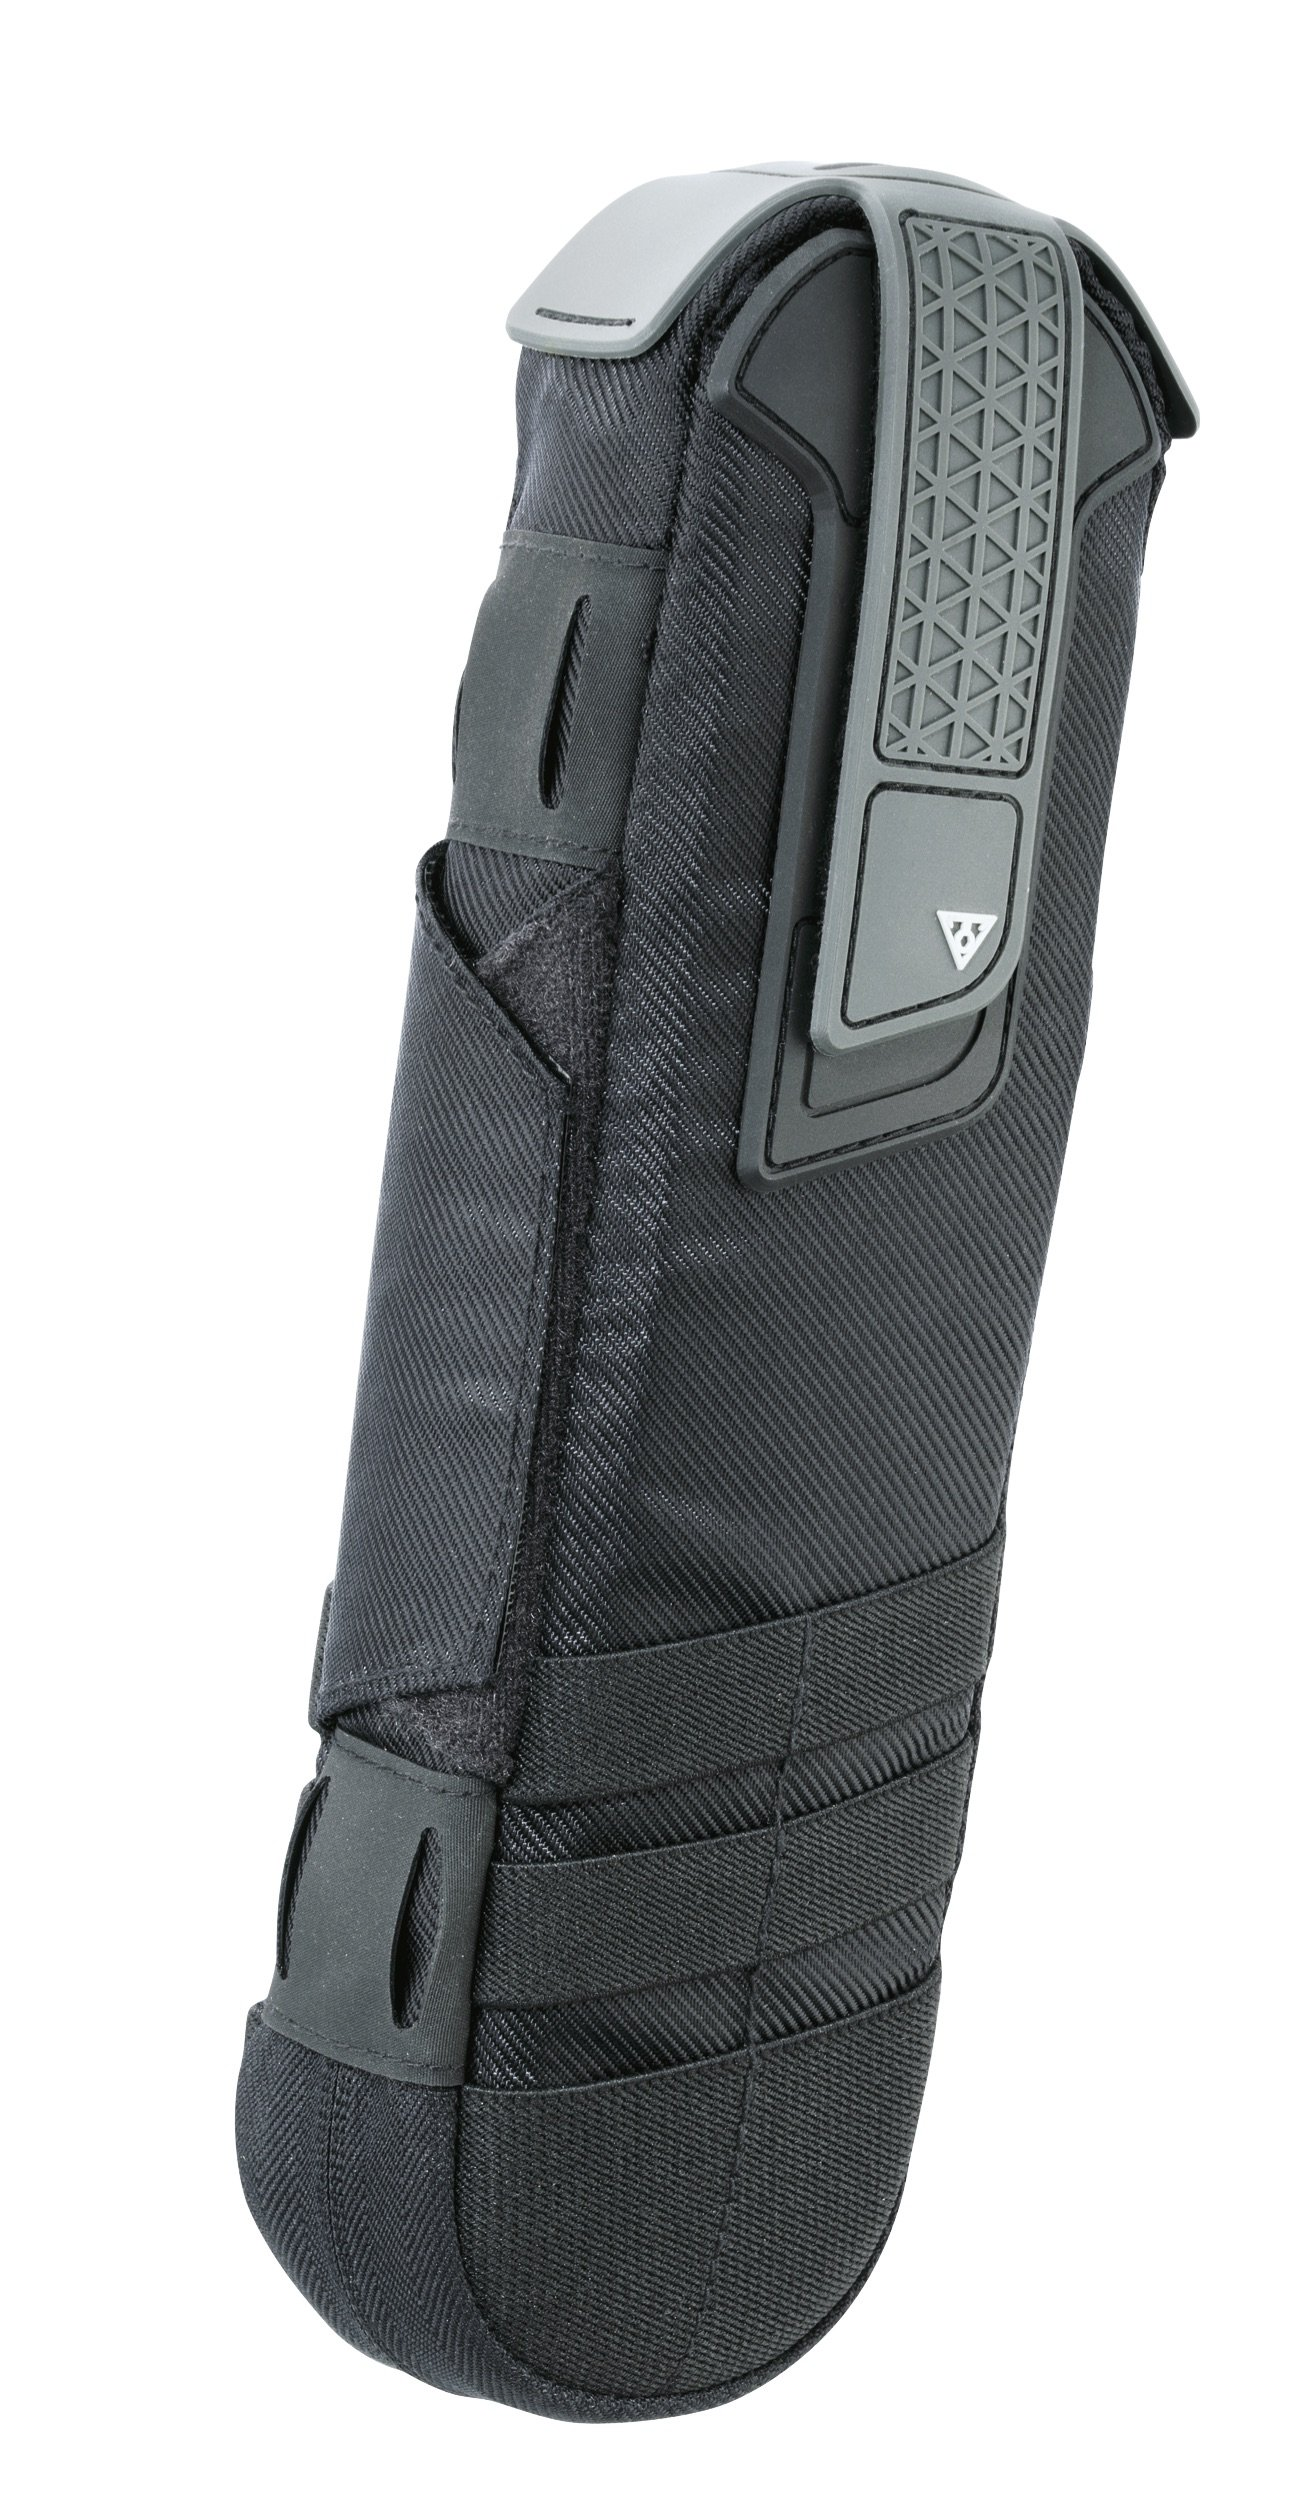 Topeak Tri-Backup Spare Tubular Tire Bag